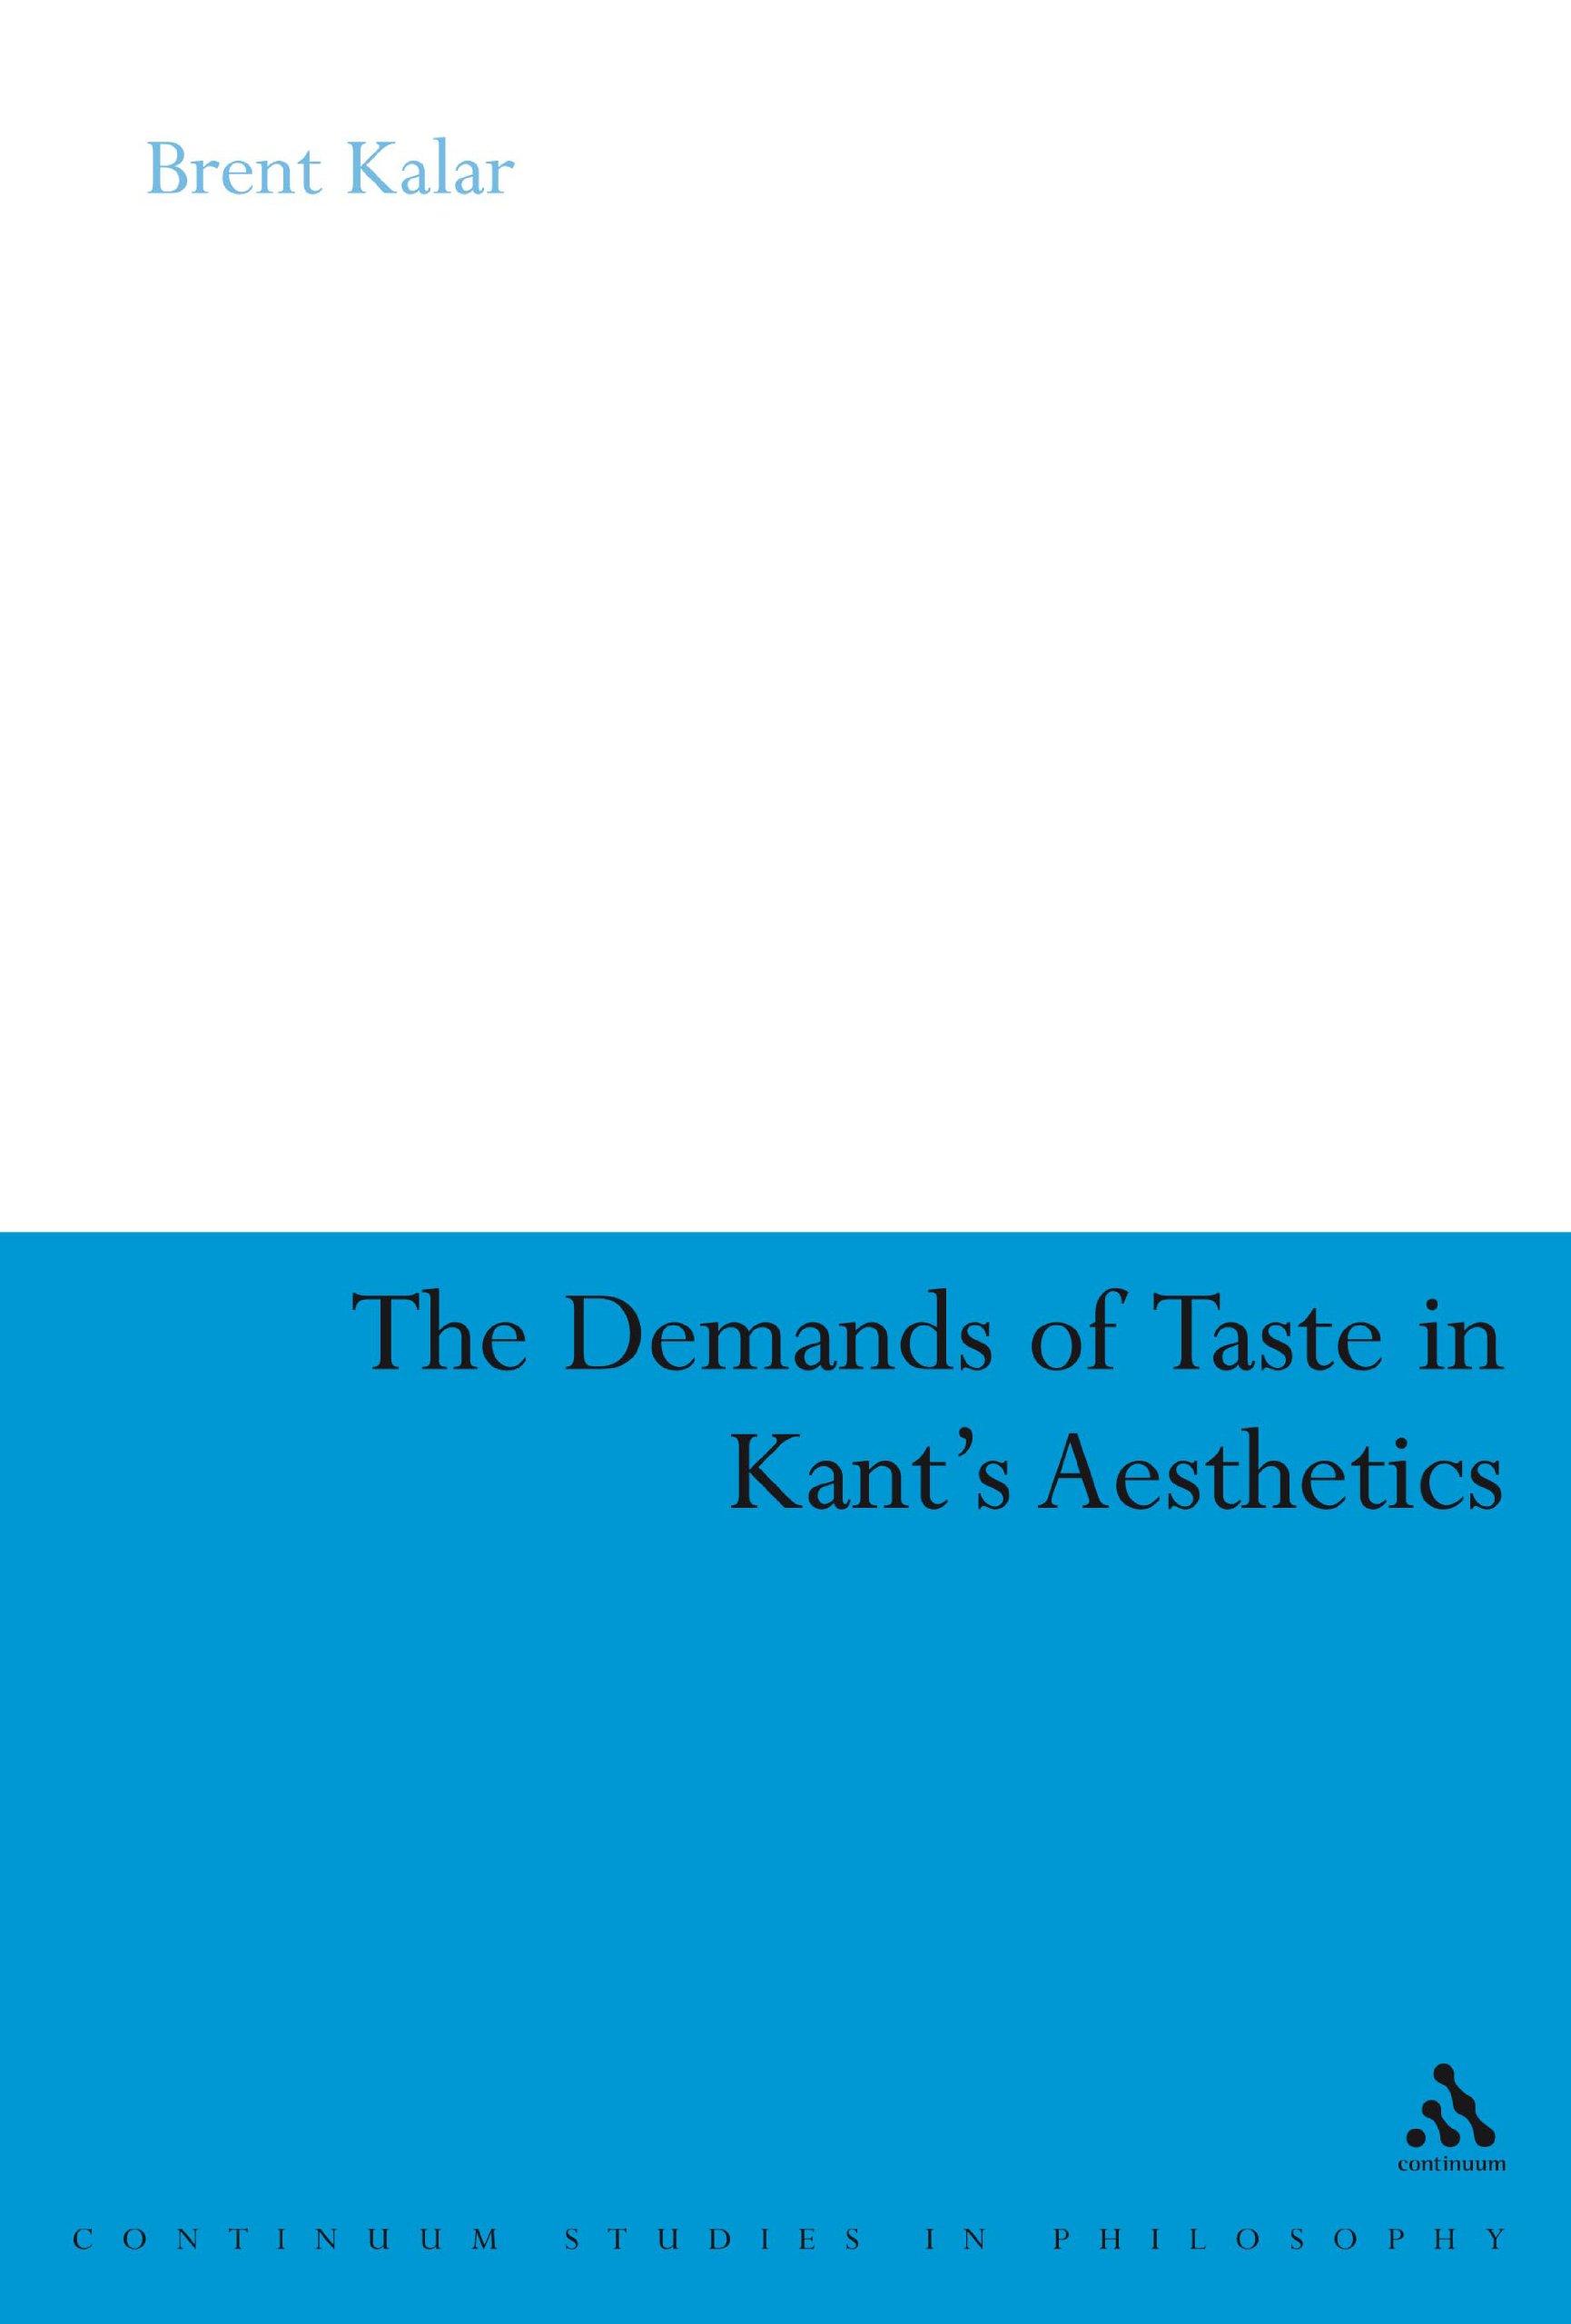 The Demands of Taste in Kants Aesthetics (Continuum Studies in Philosophy)